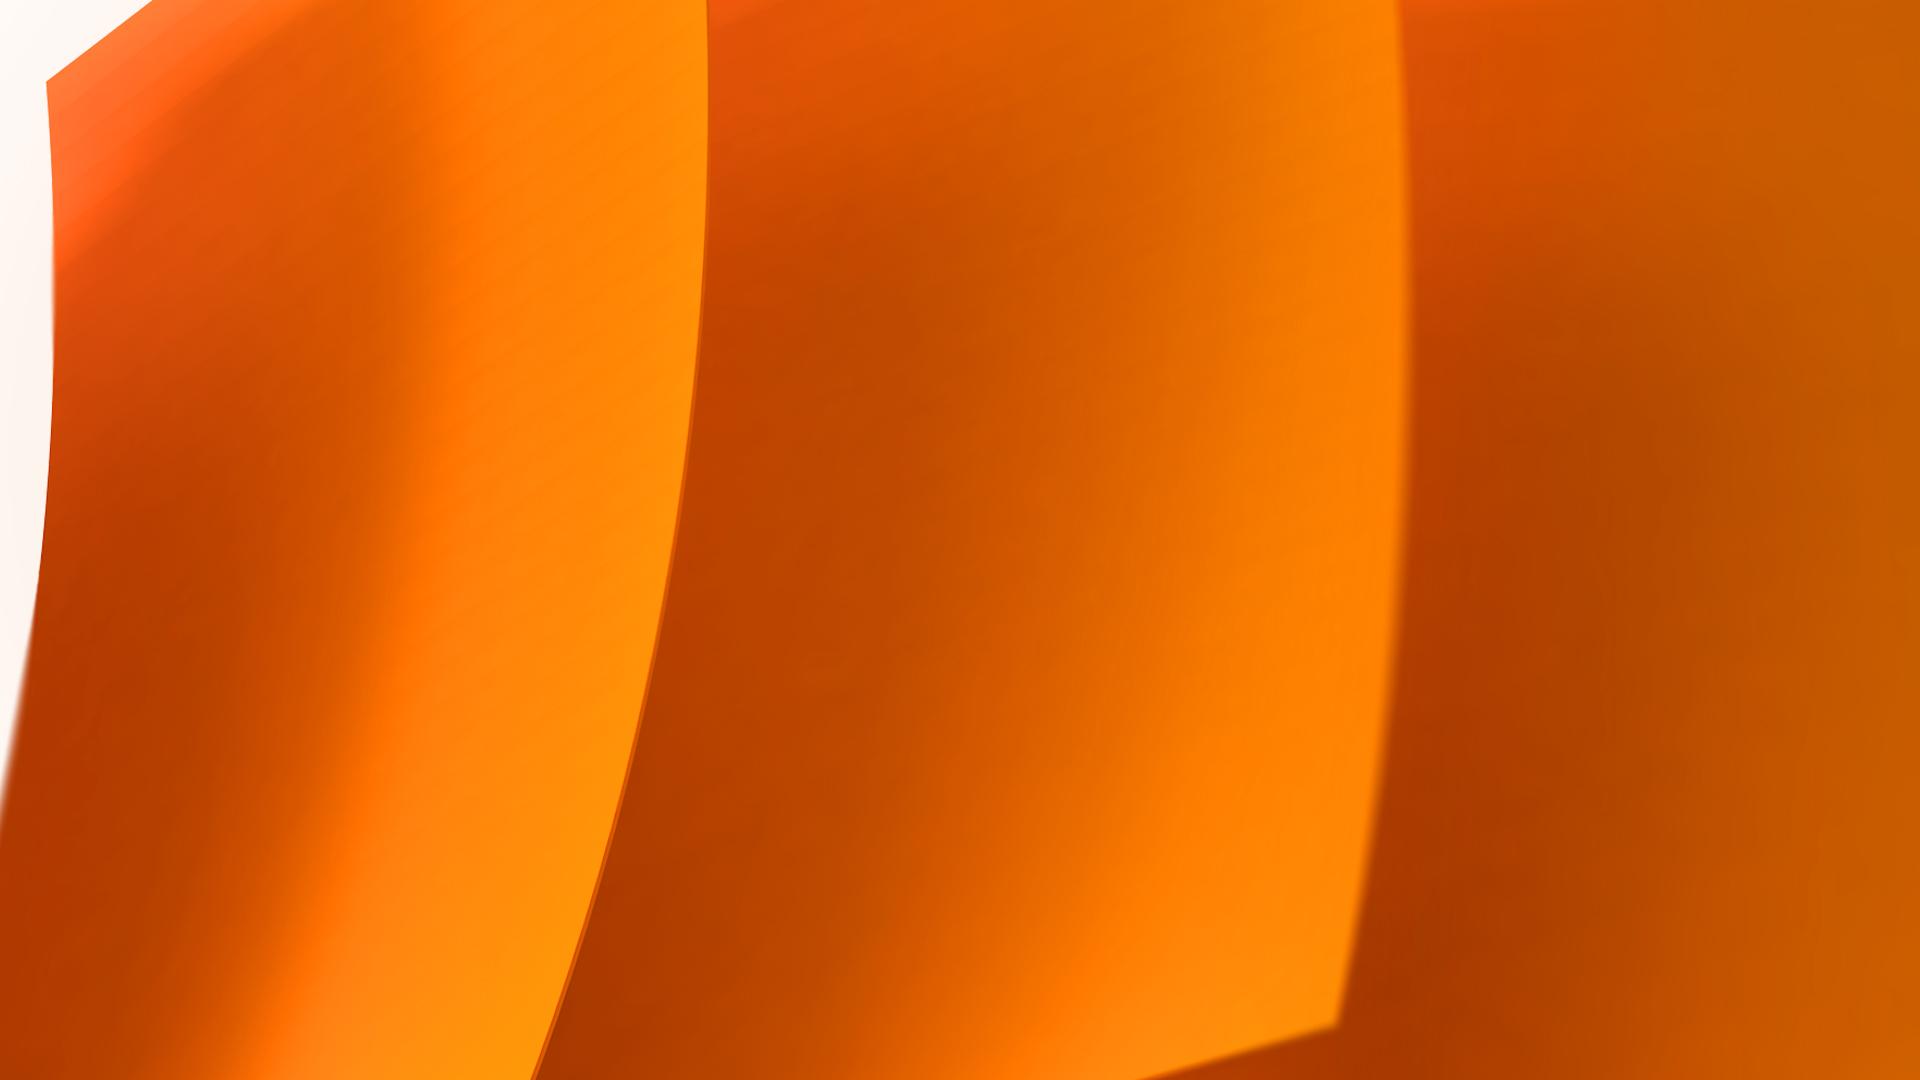 PSD_02_1.jpg